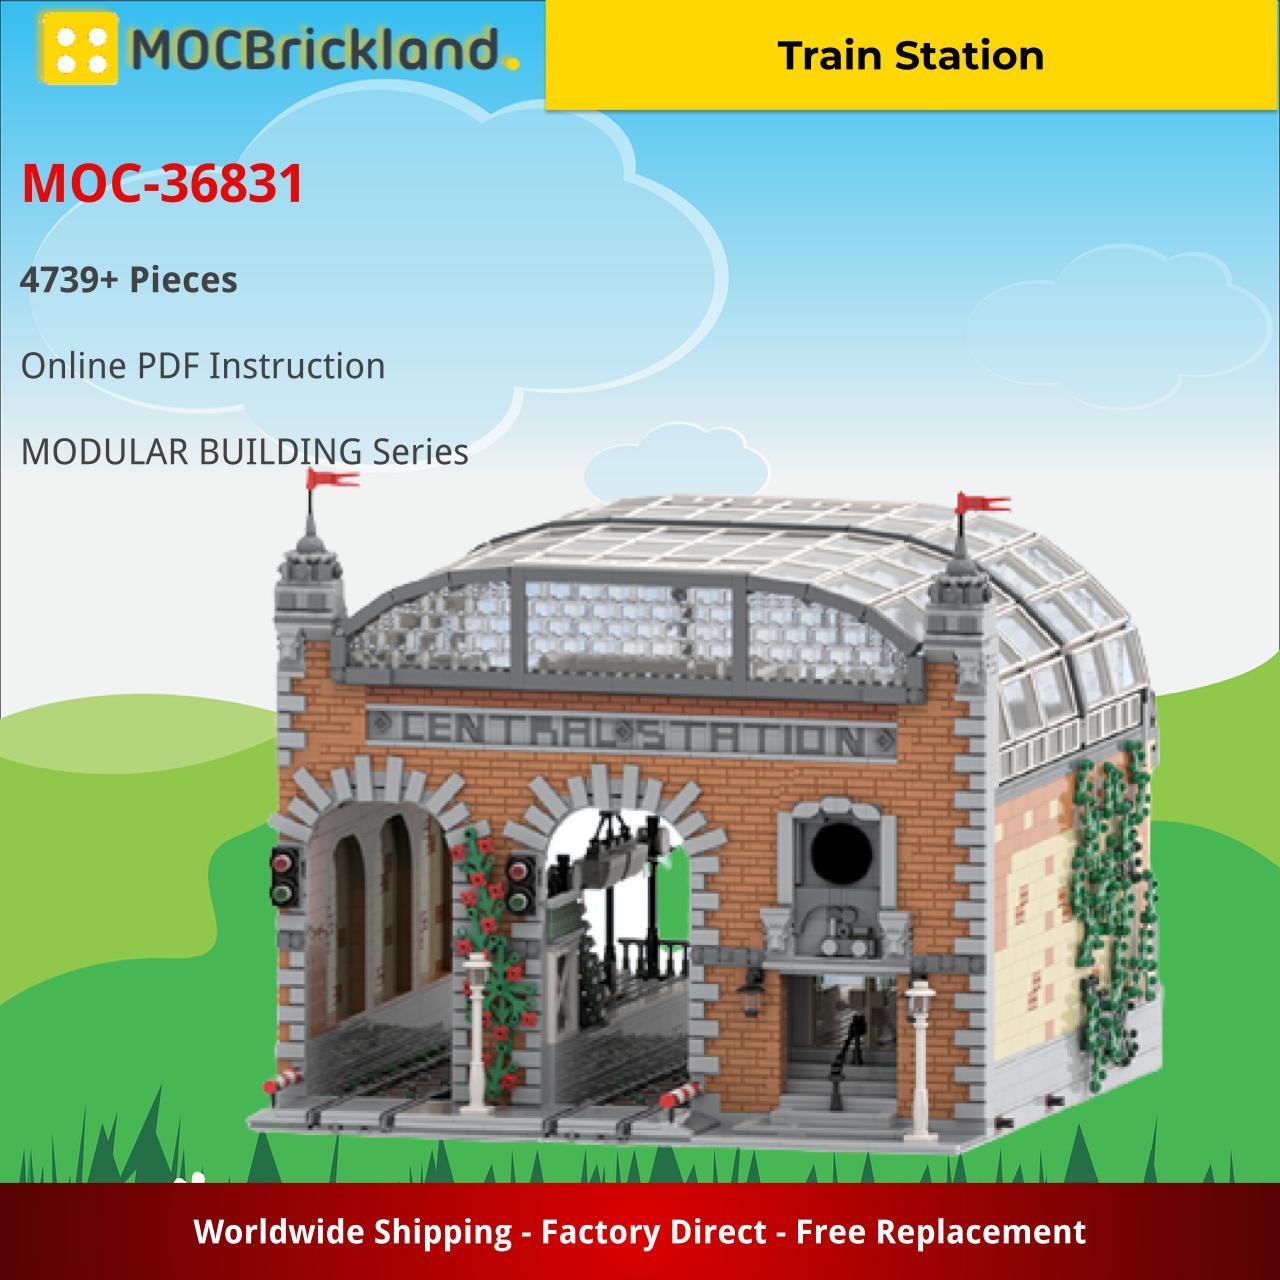 Train Station MODULAR BUILDING MOC-36831 by Steinekonig WITH 4739 PIECES